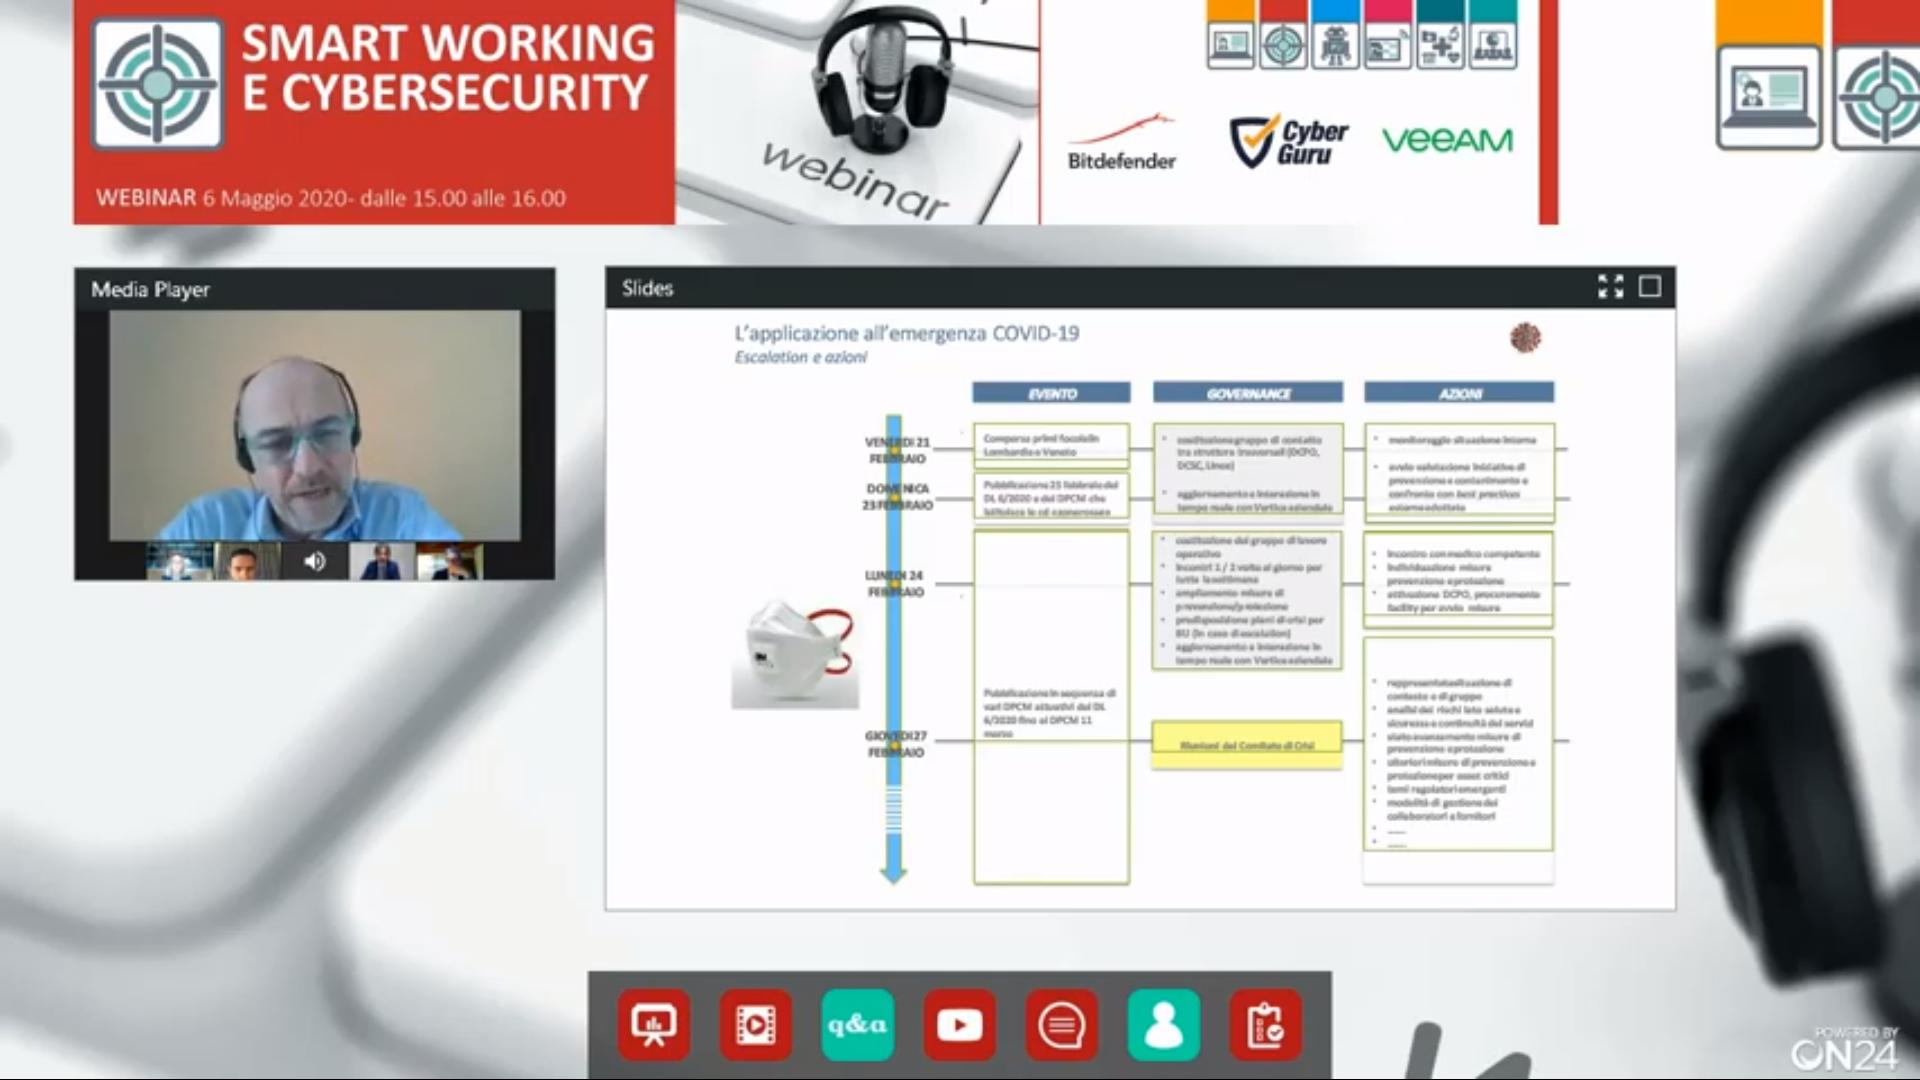 Online il Webinar sulla Cybersecurity per lo Smart Working